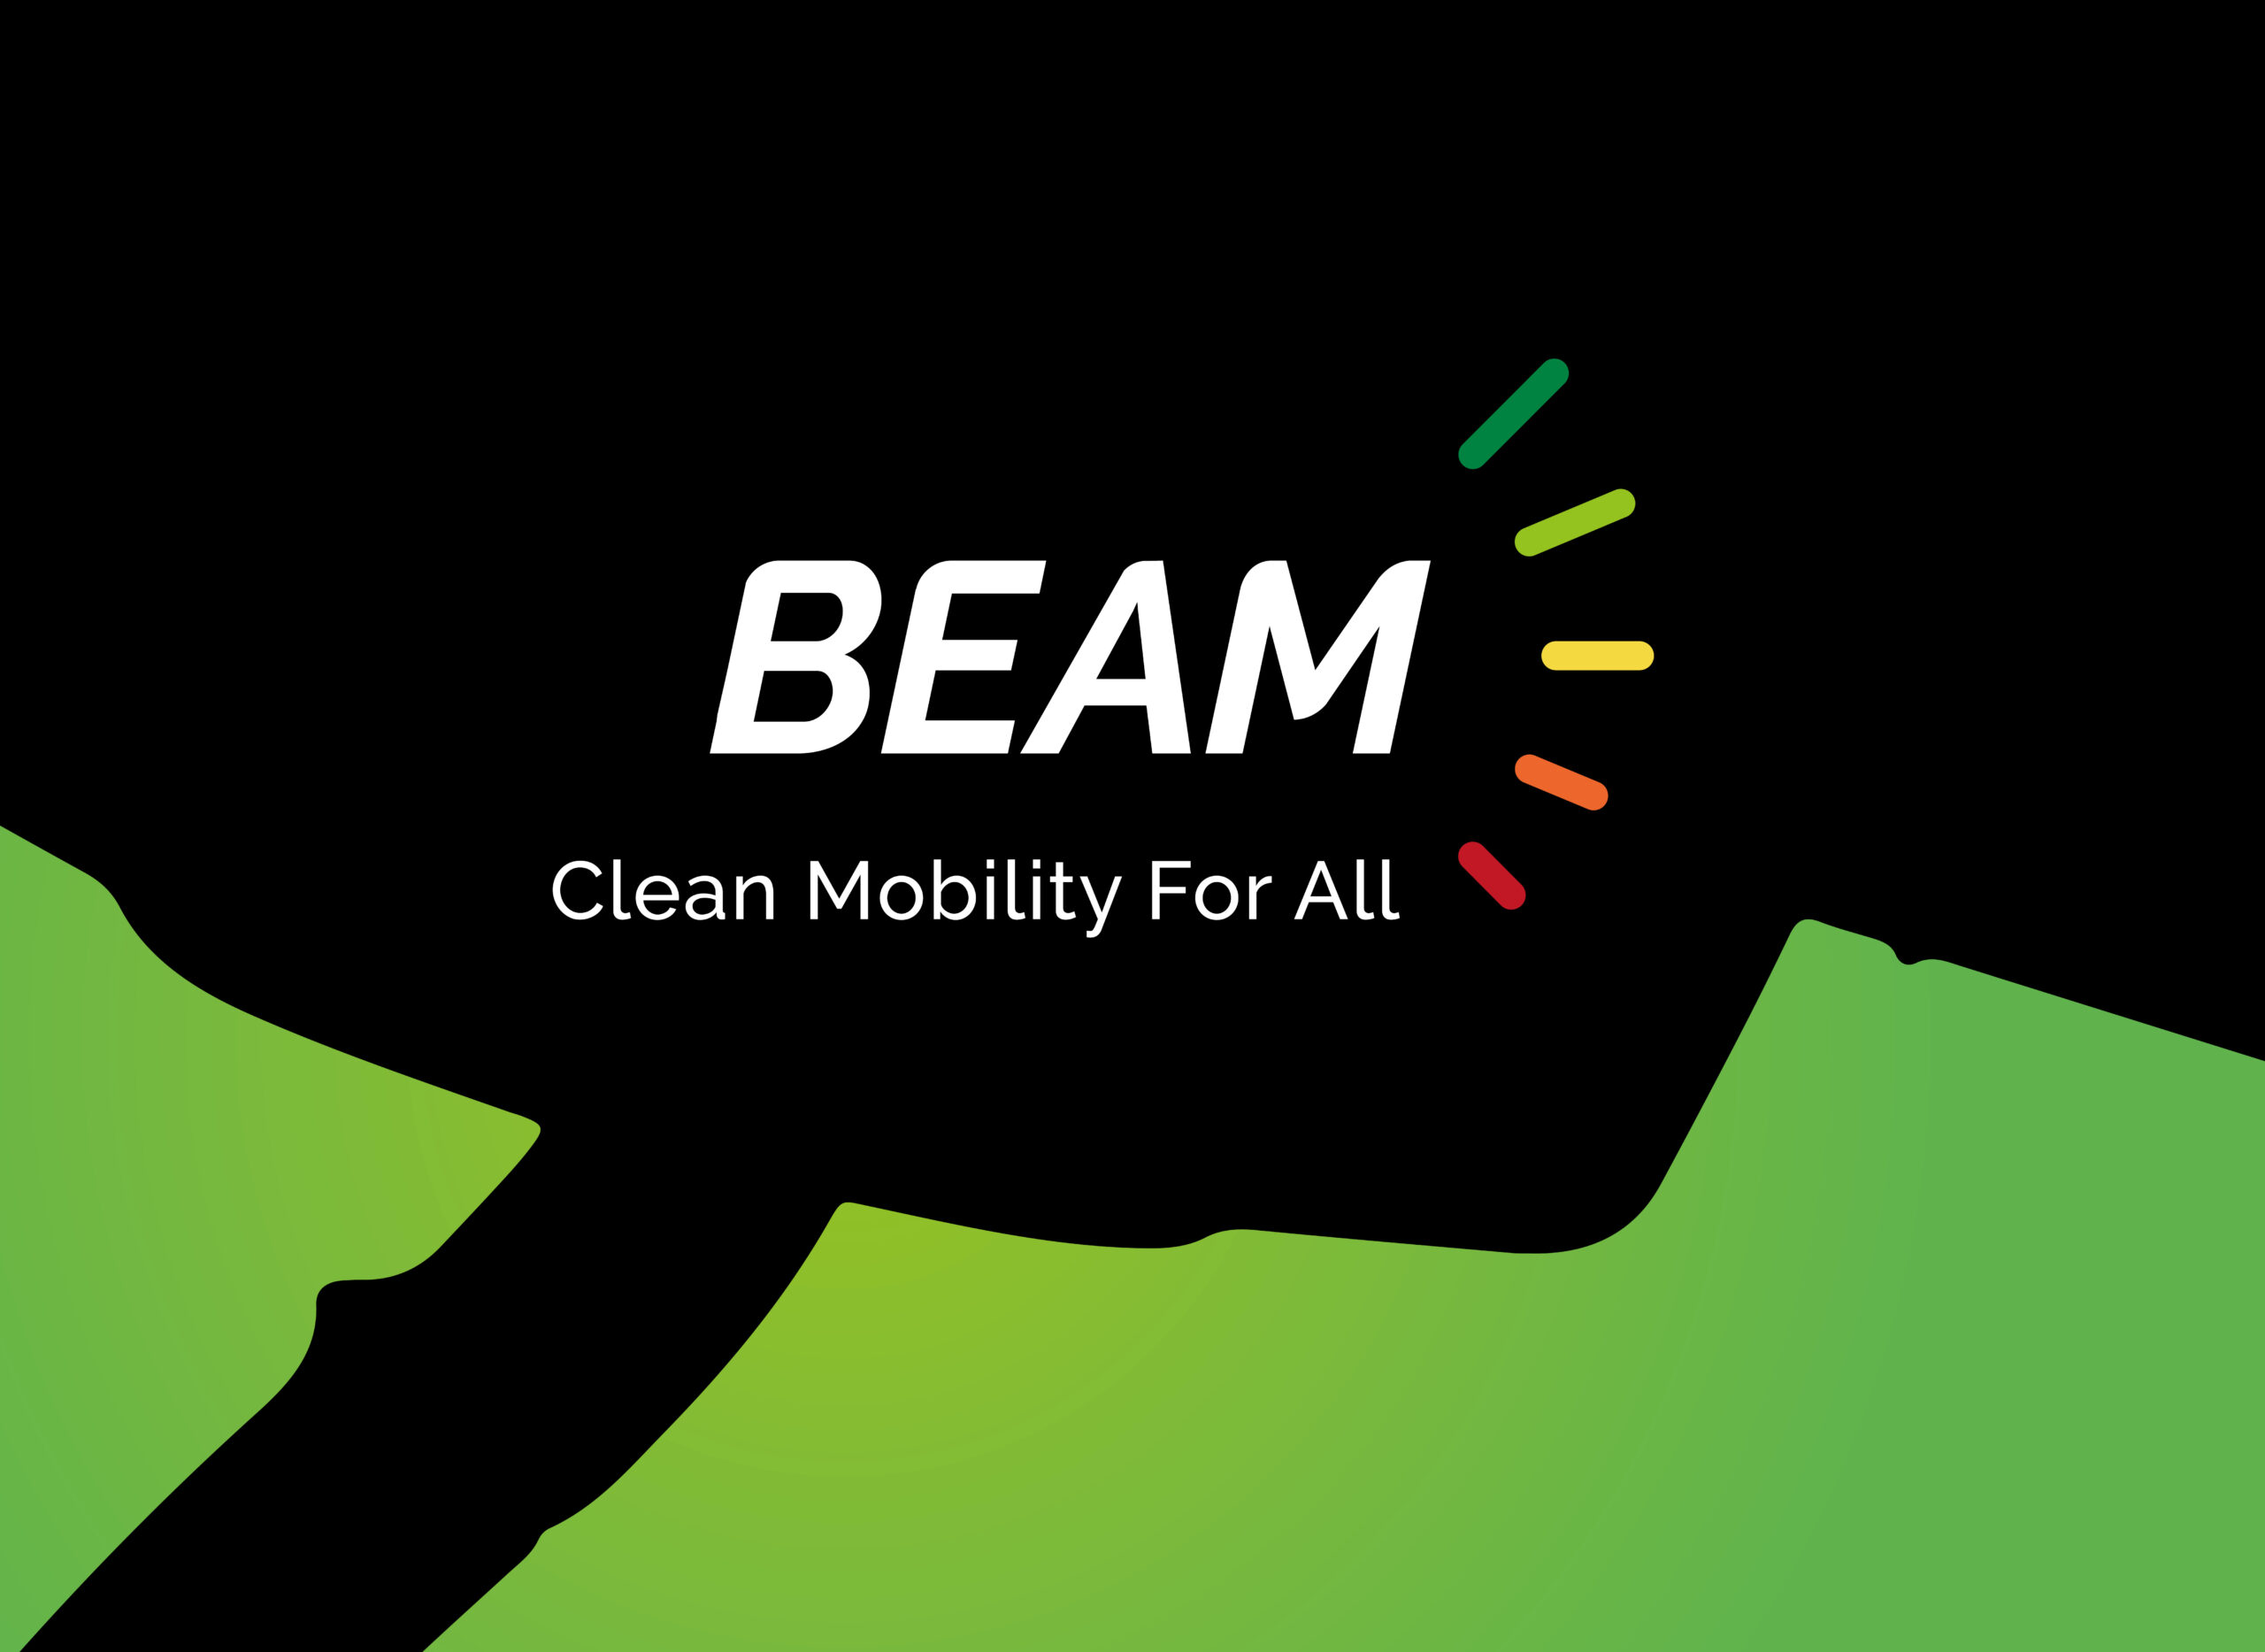 BEAM logo and brand style